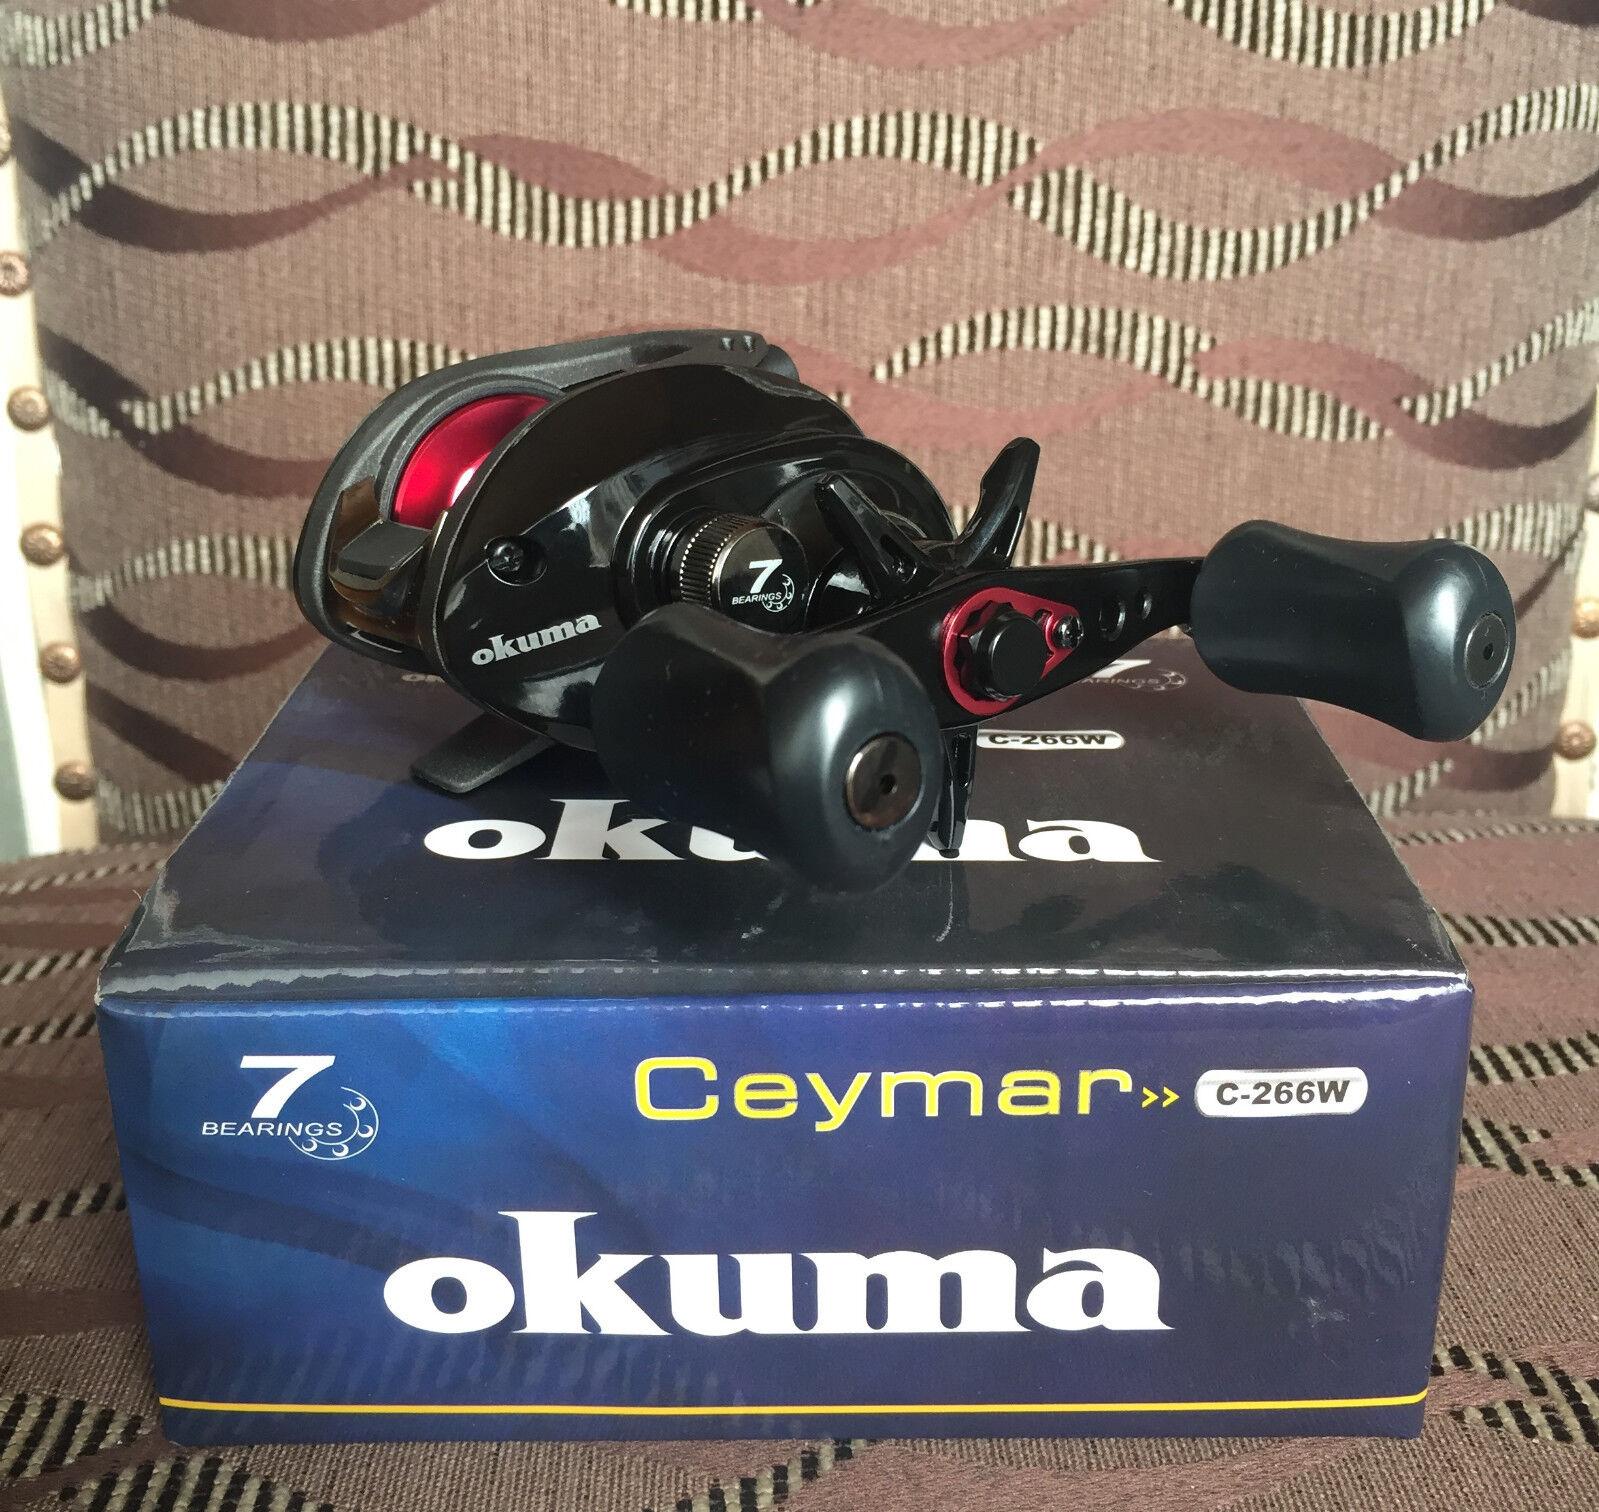 Okuma Ceymar C-266W Rechtehand Baitcaster Multirolle